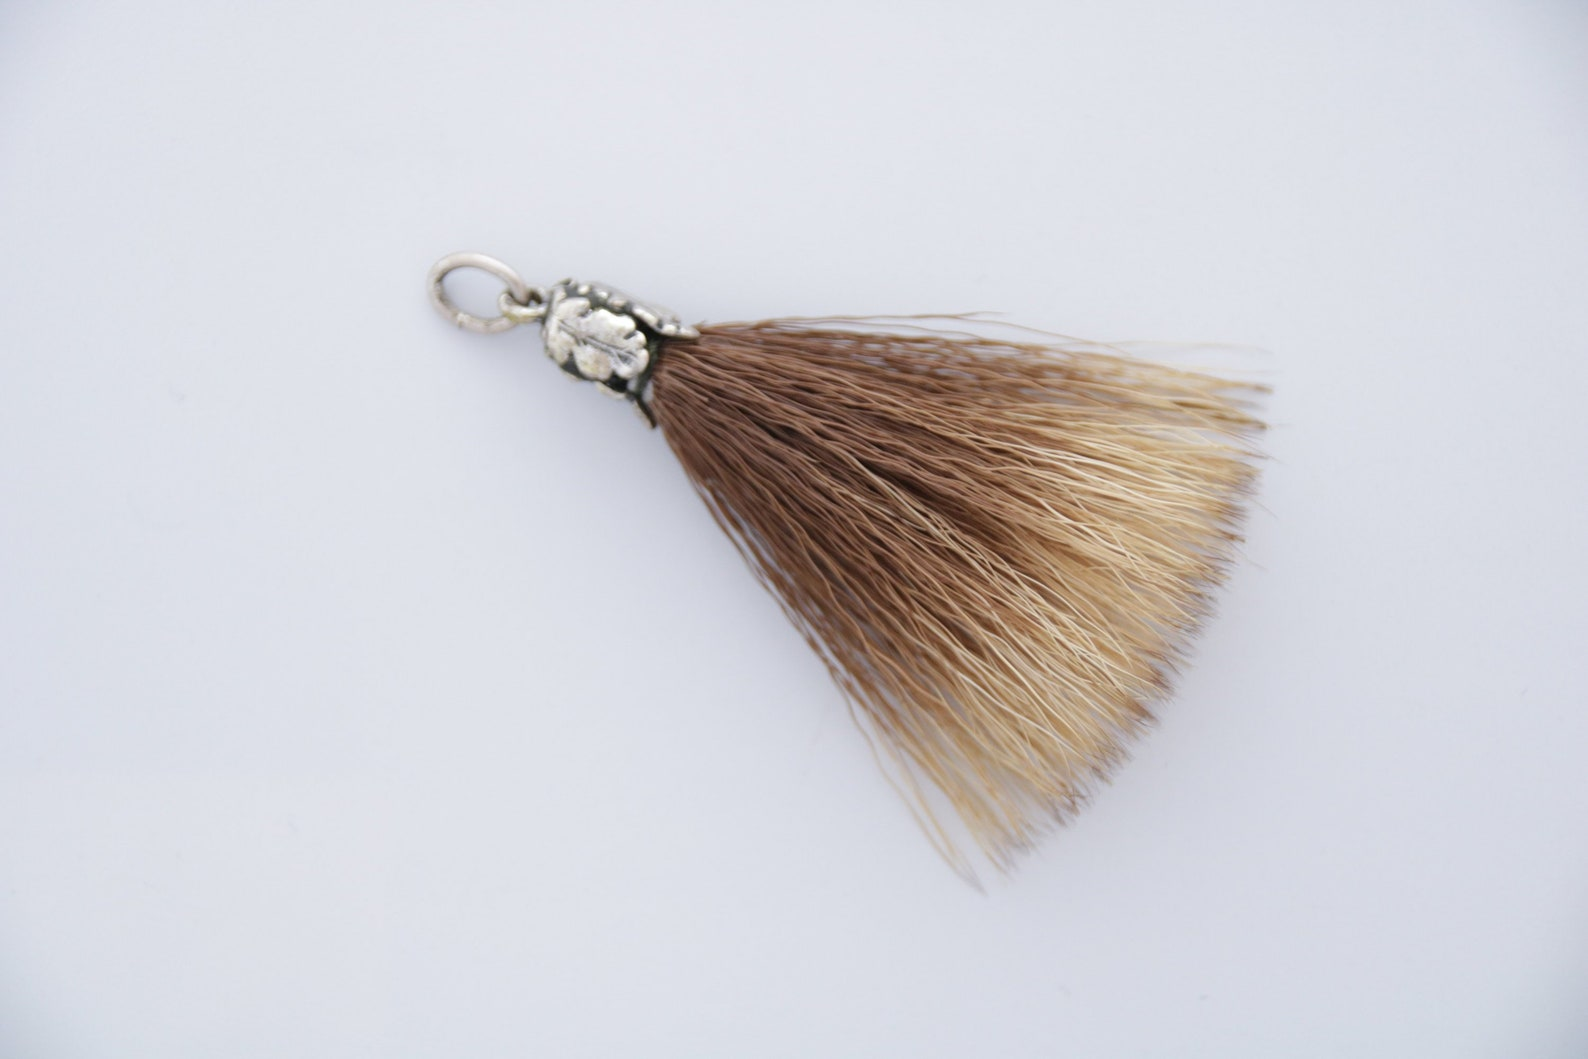 Boar's Hair Pendant, Antique Boars Hair & Silver Bavarian Charivari Pendant, Boar's Hair Charm, Antique Bavarian Hunting Trophy Charivari